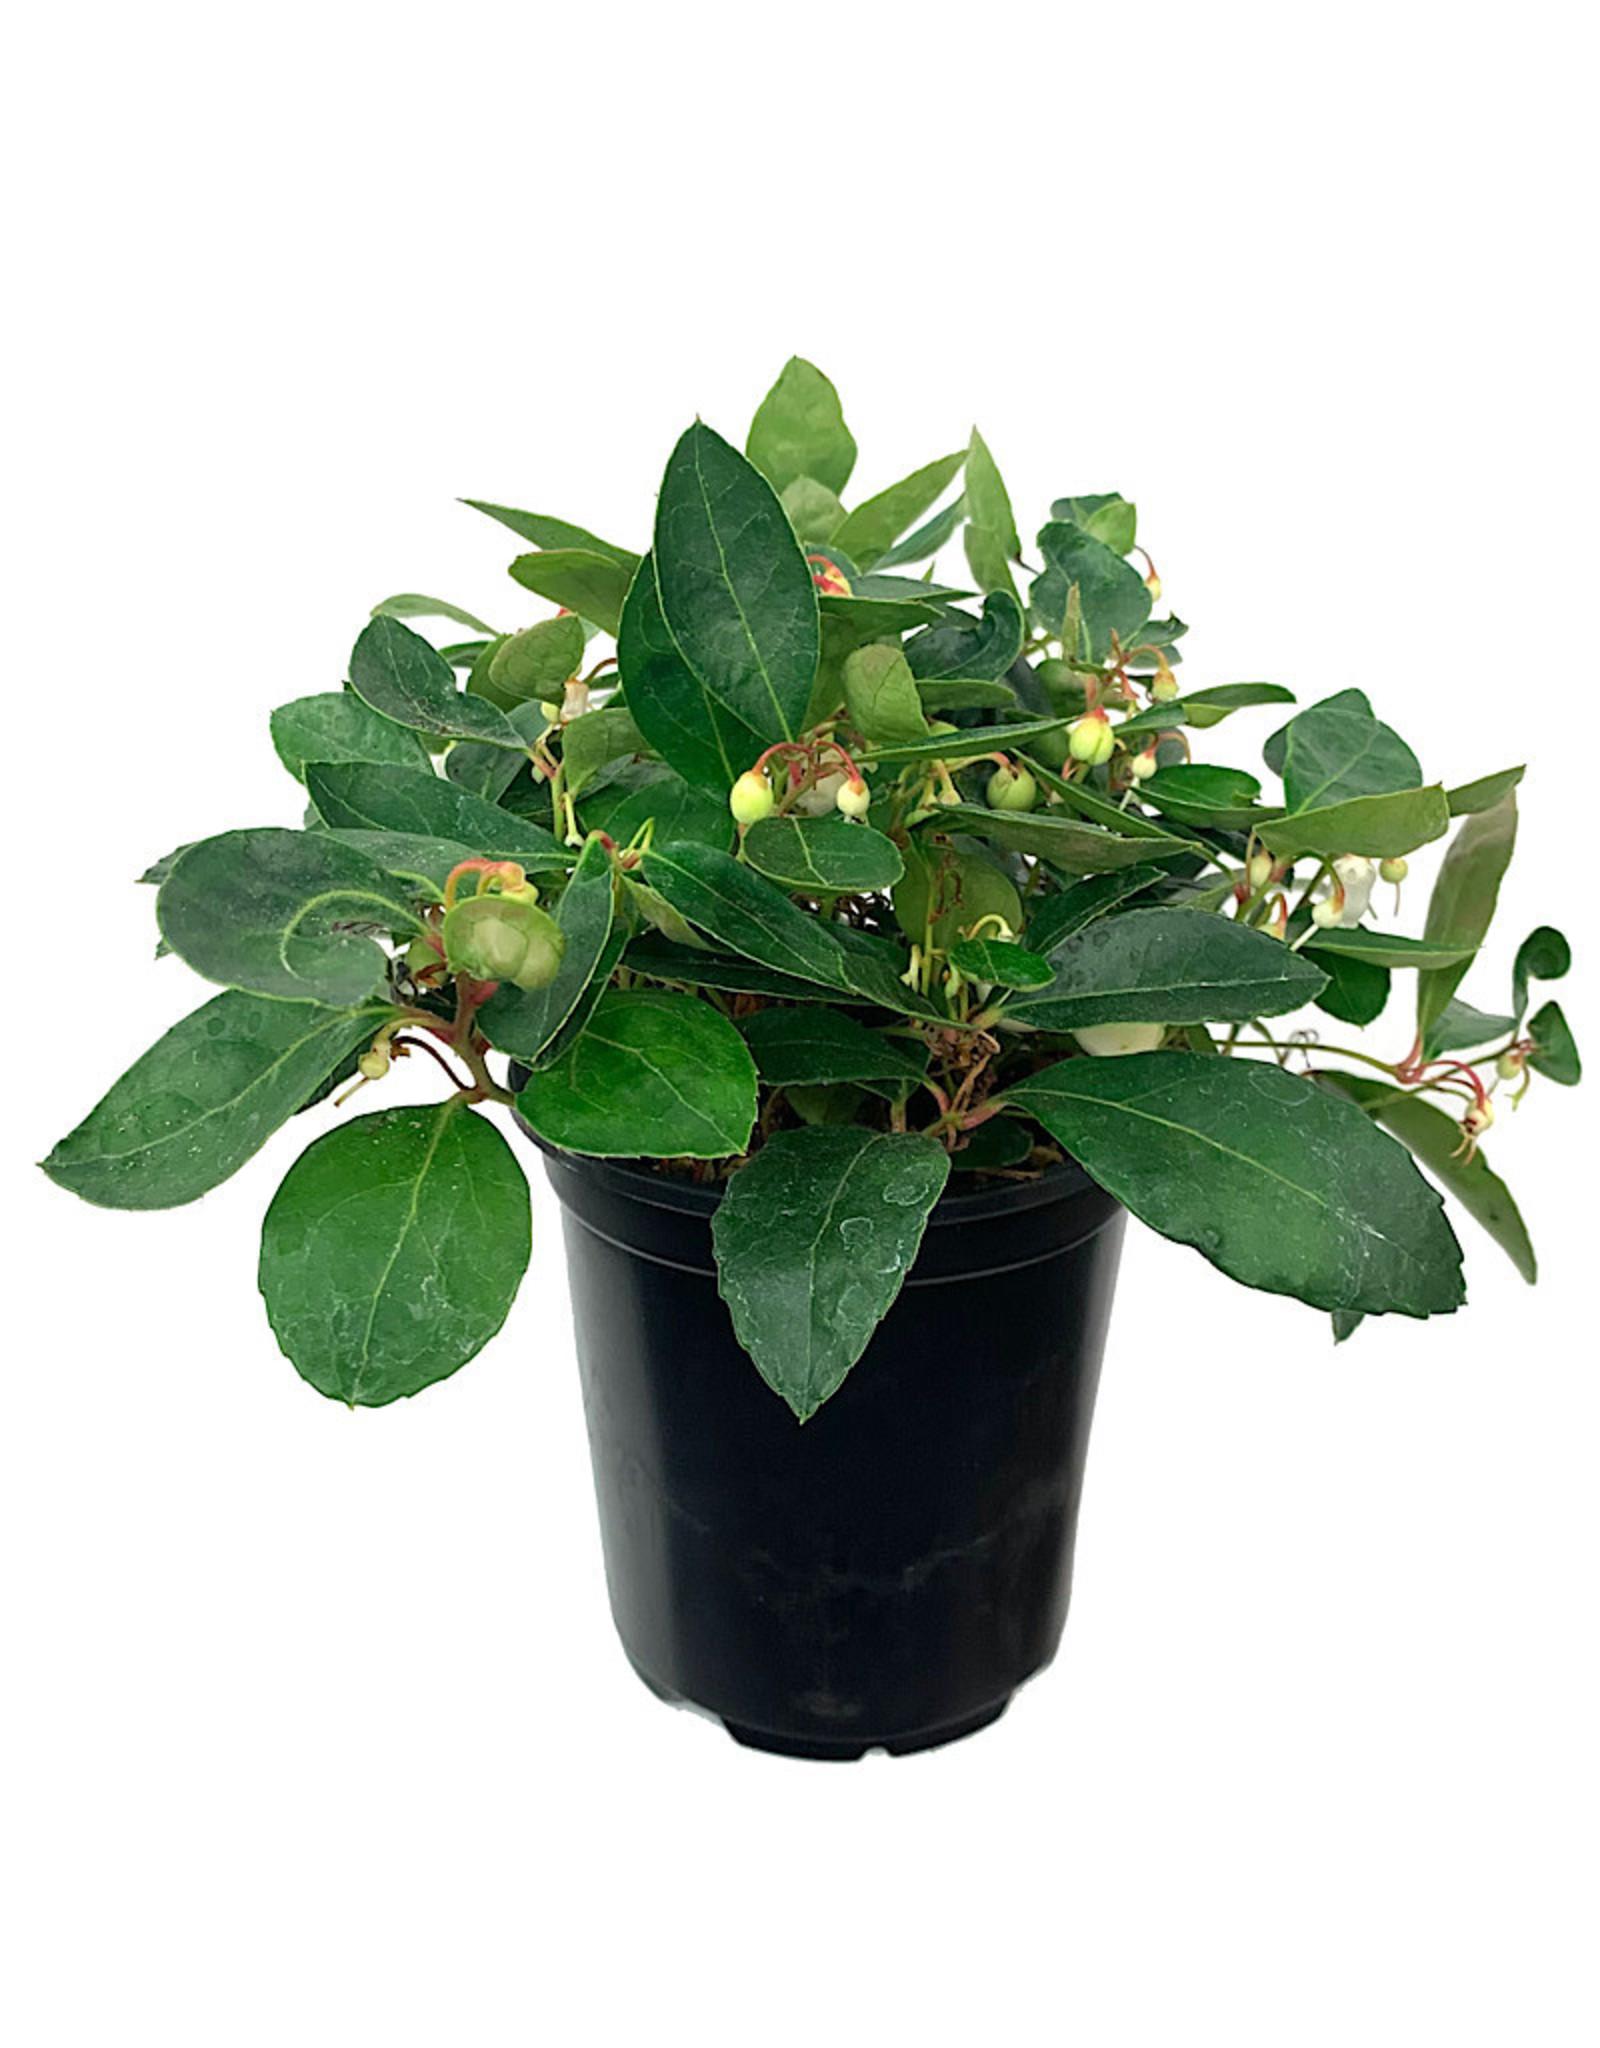 Gaultheria procumbens 'Winter Fiesta' Quart